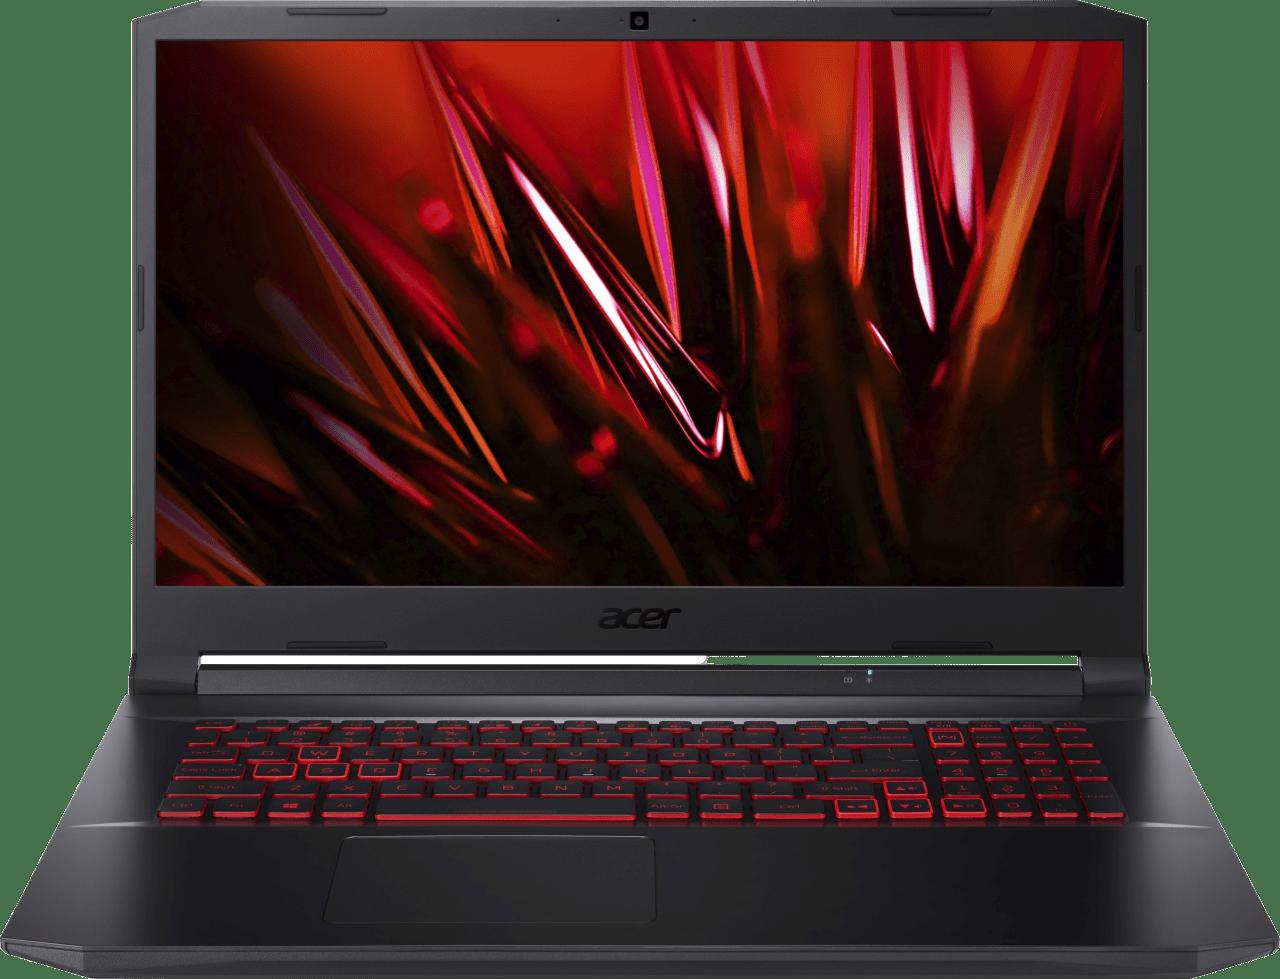 Schwarz / Rot Acer Nitro 5 AN517-53-51FQ - Gaming Notebook - Intel® Core™ i5-11300H - 16GB - 512GB SSD - NVIDIA® GeForce® GTX 1650.1